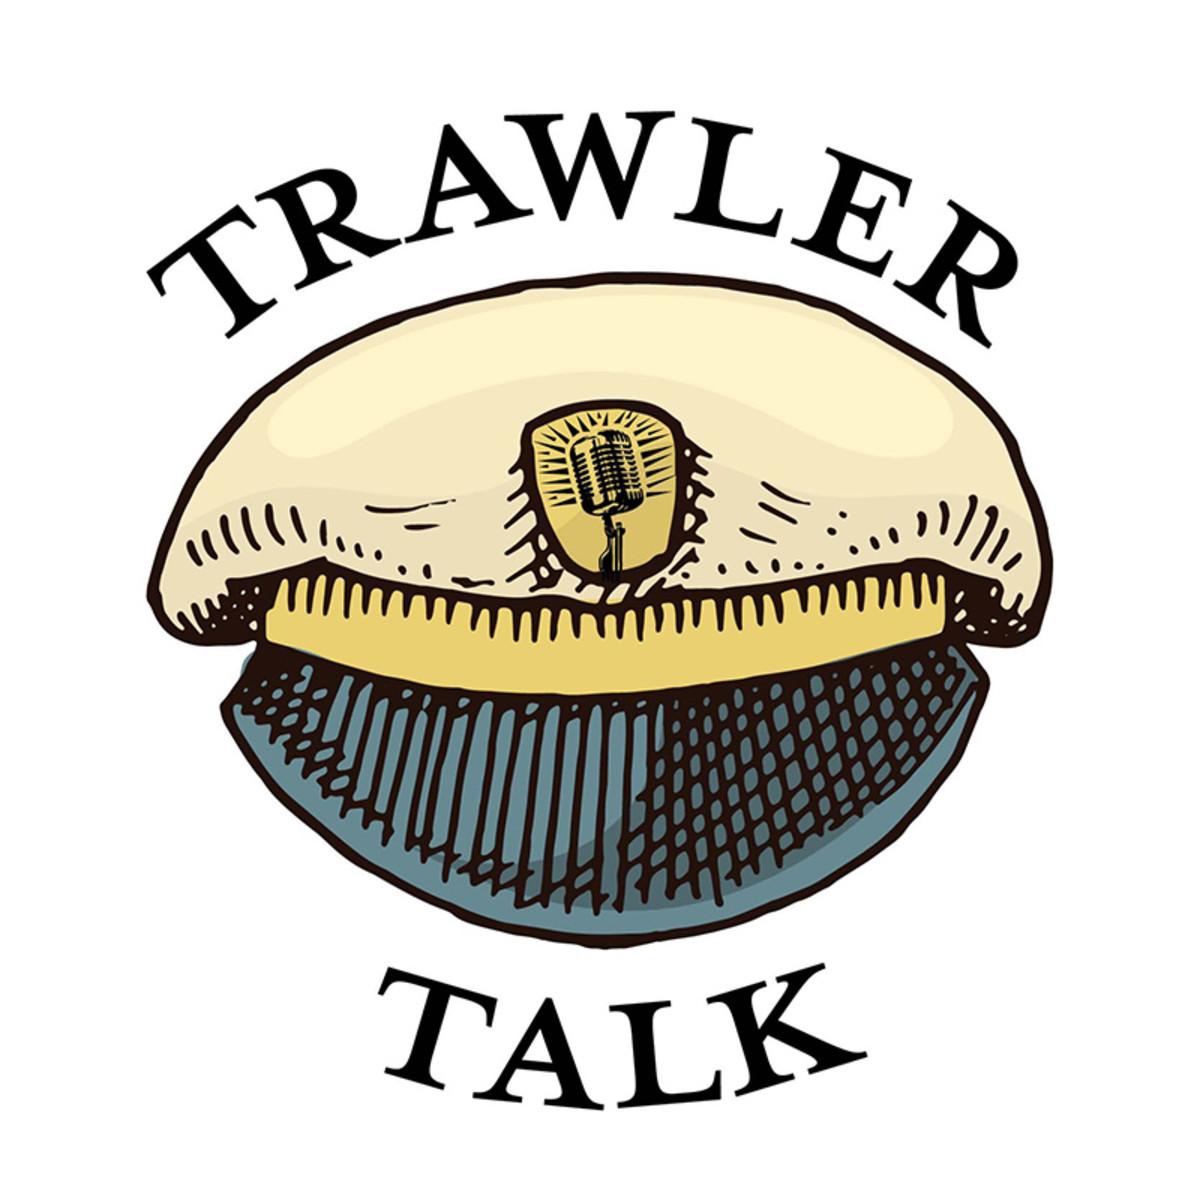 2_Podcast_Trawler Talk